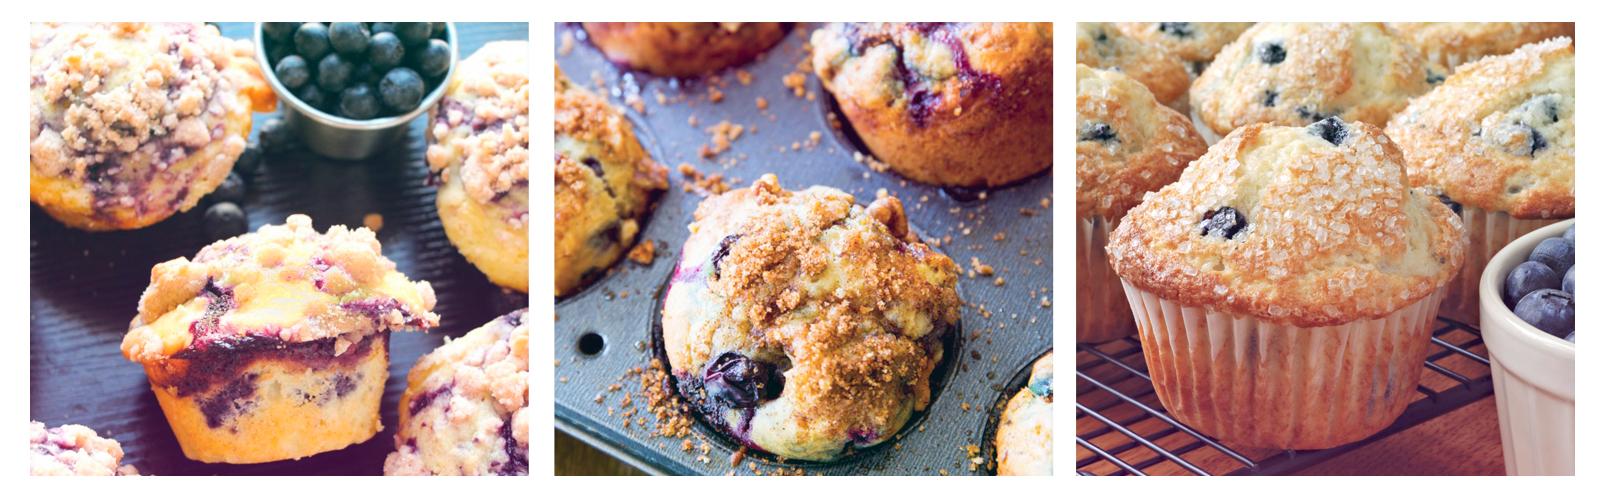 Muffins de blueberry con strussel